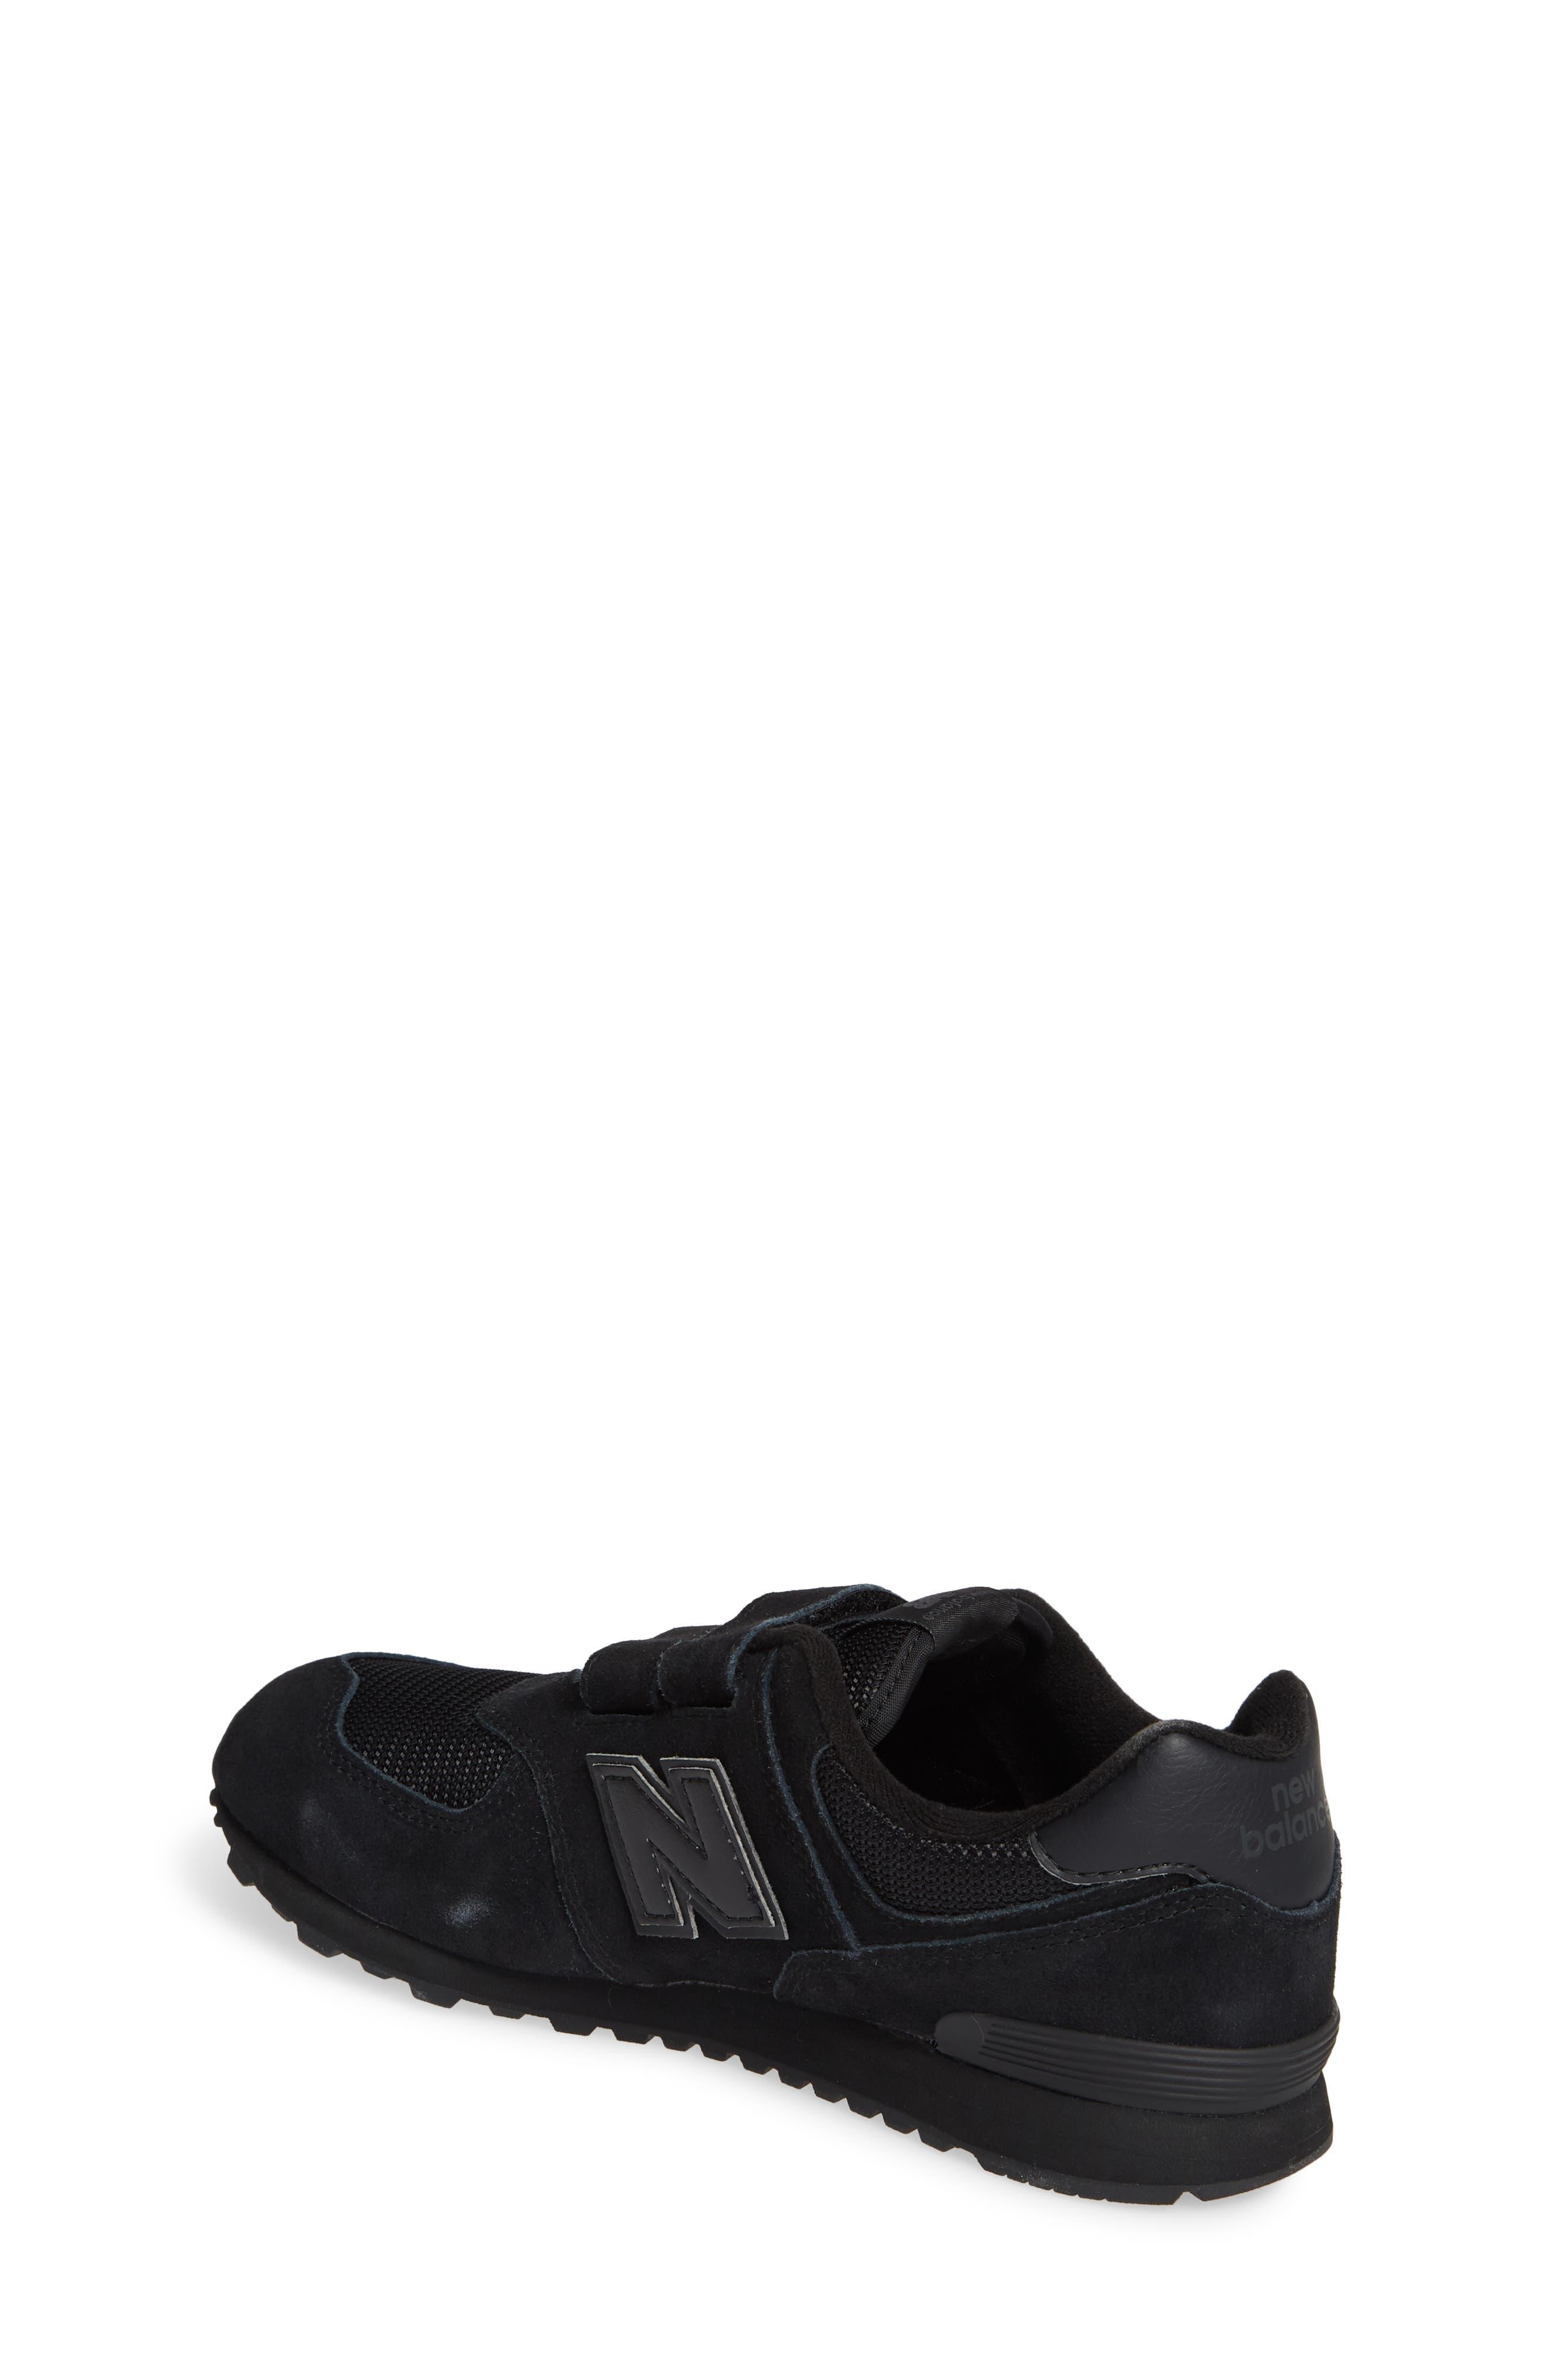 NEW BALANCE,                             574 Retro Surf Sneaker,                             Alternate thumbnail 2, color,                             BLACK/ BLACK